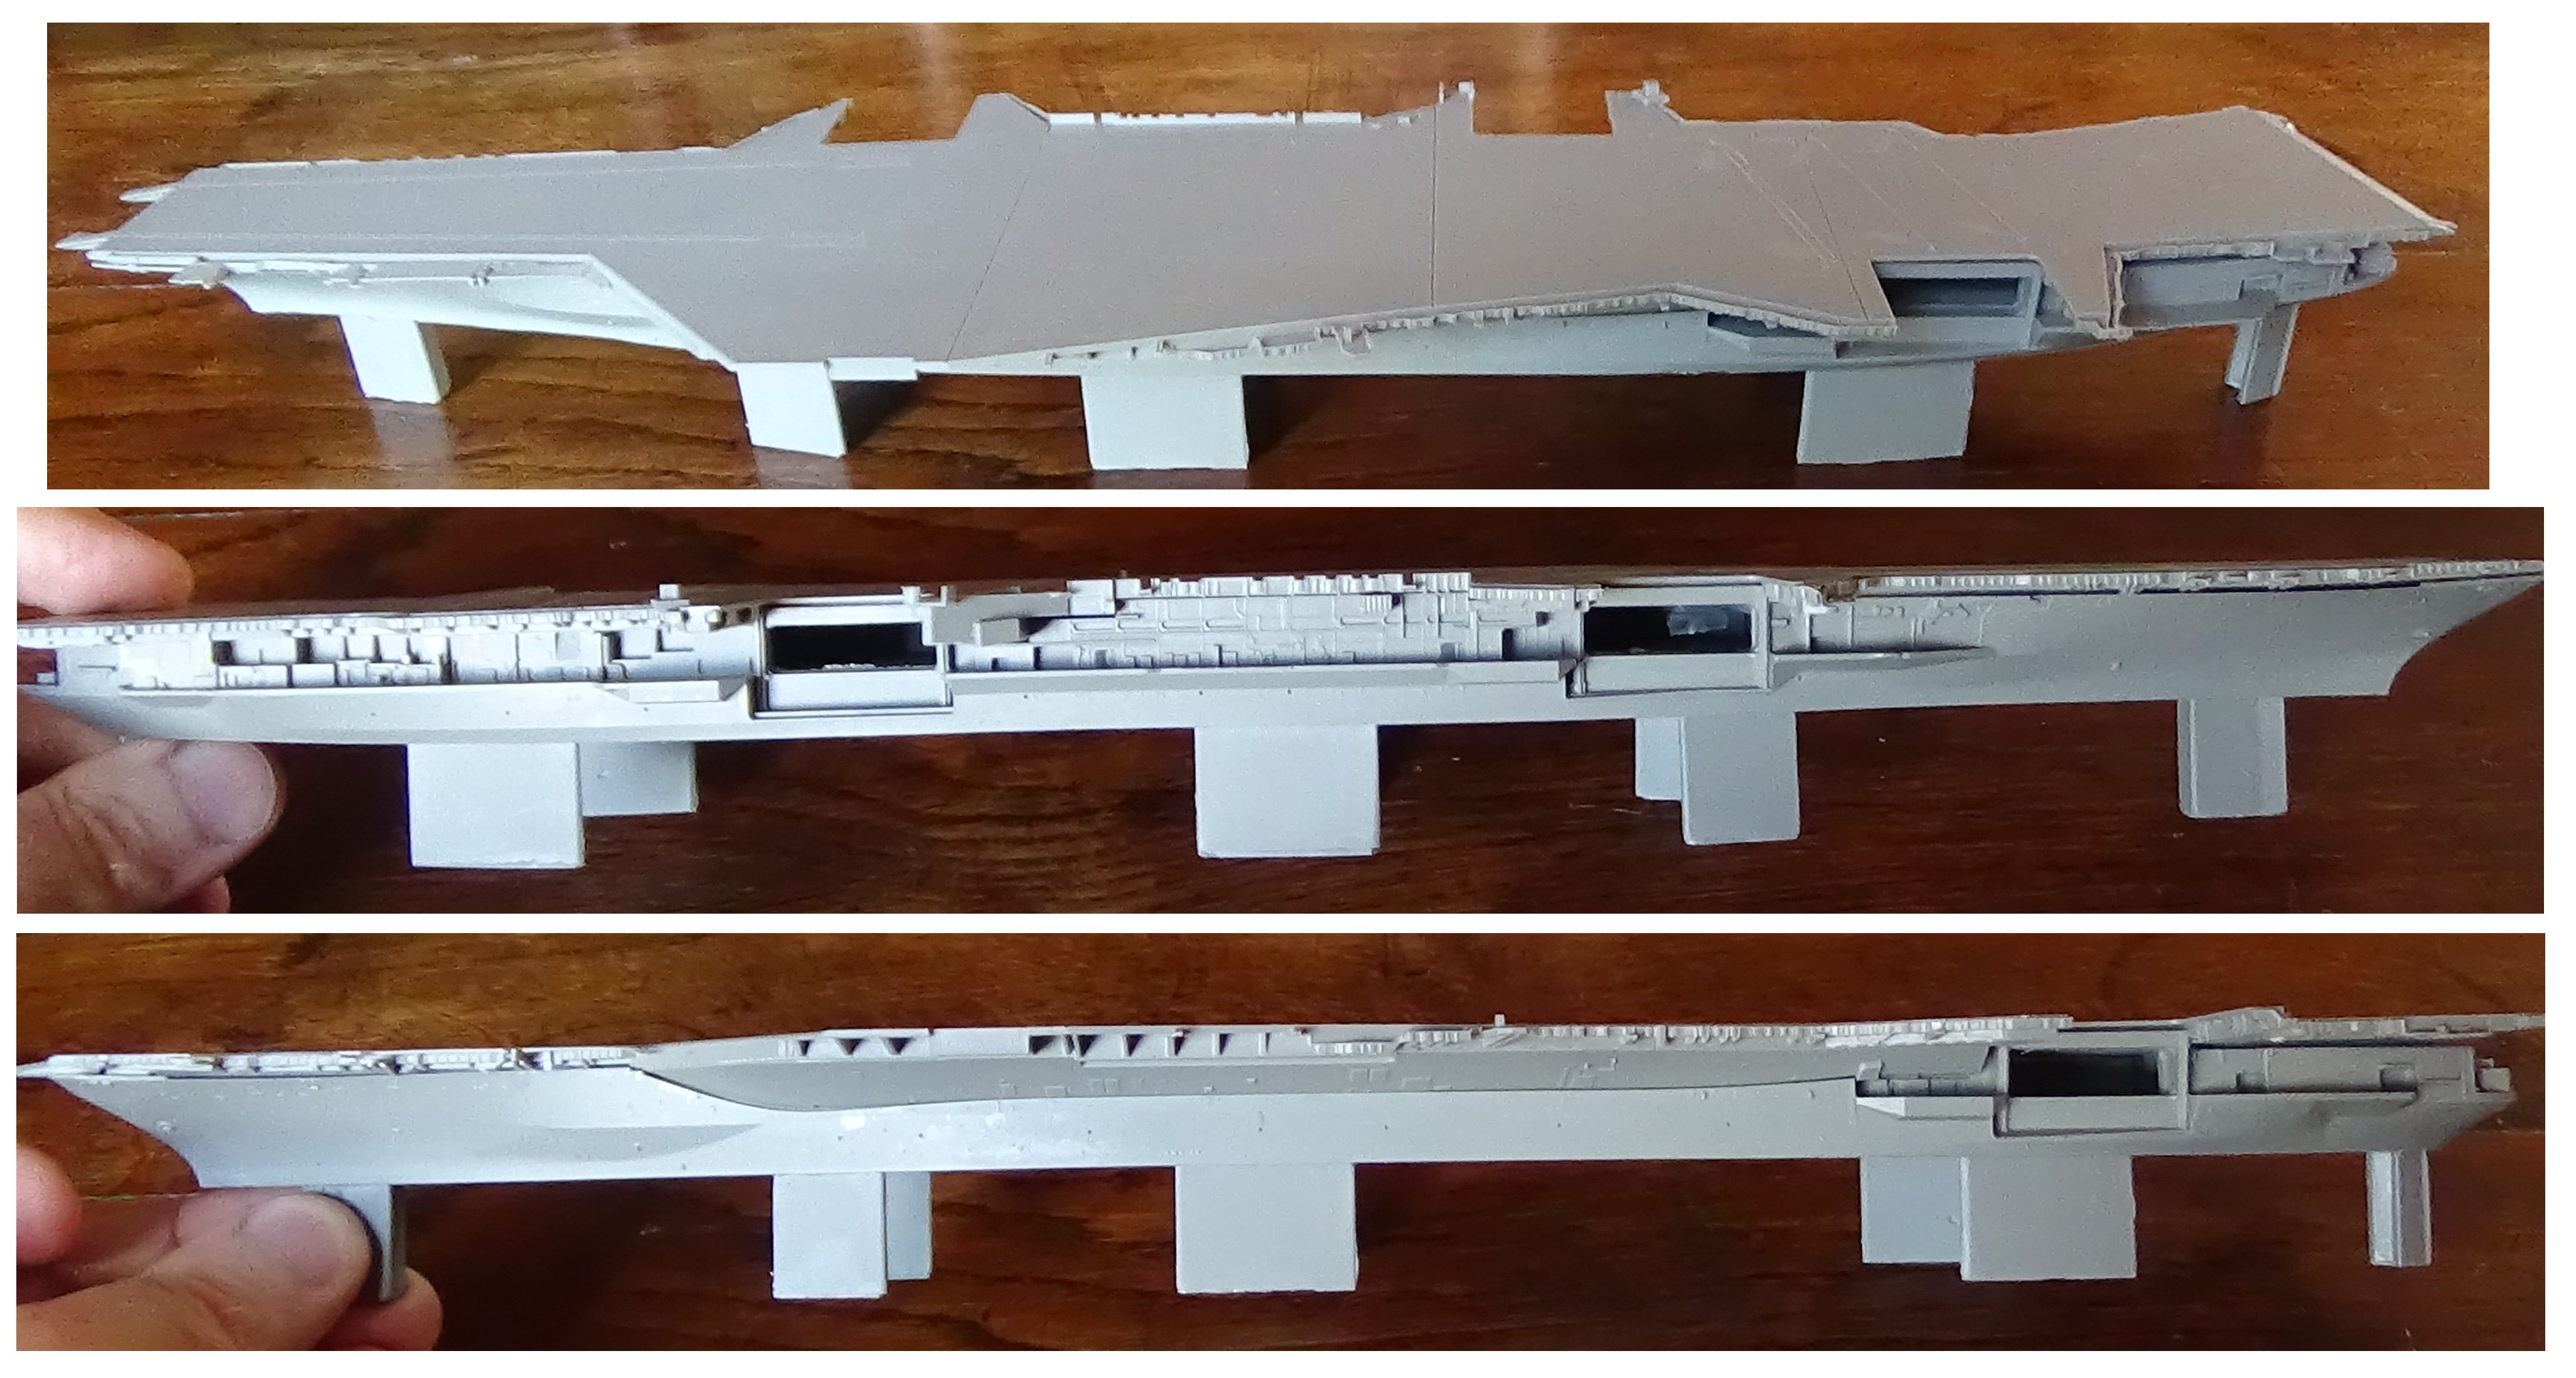 [USS Midway CVA-41] Porte avions lourd américain-700e-Orange Hobby 17071905022123134915155986